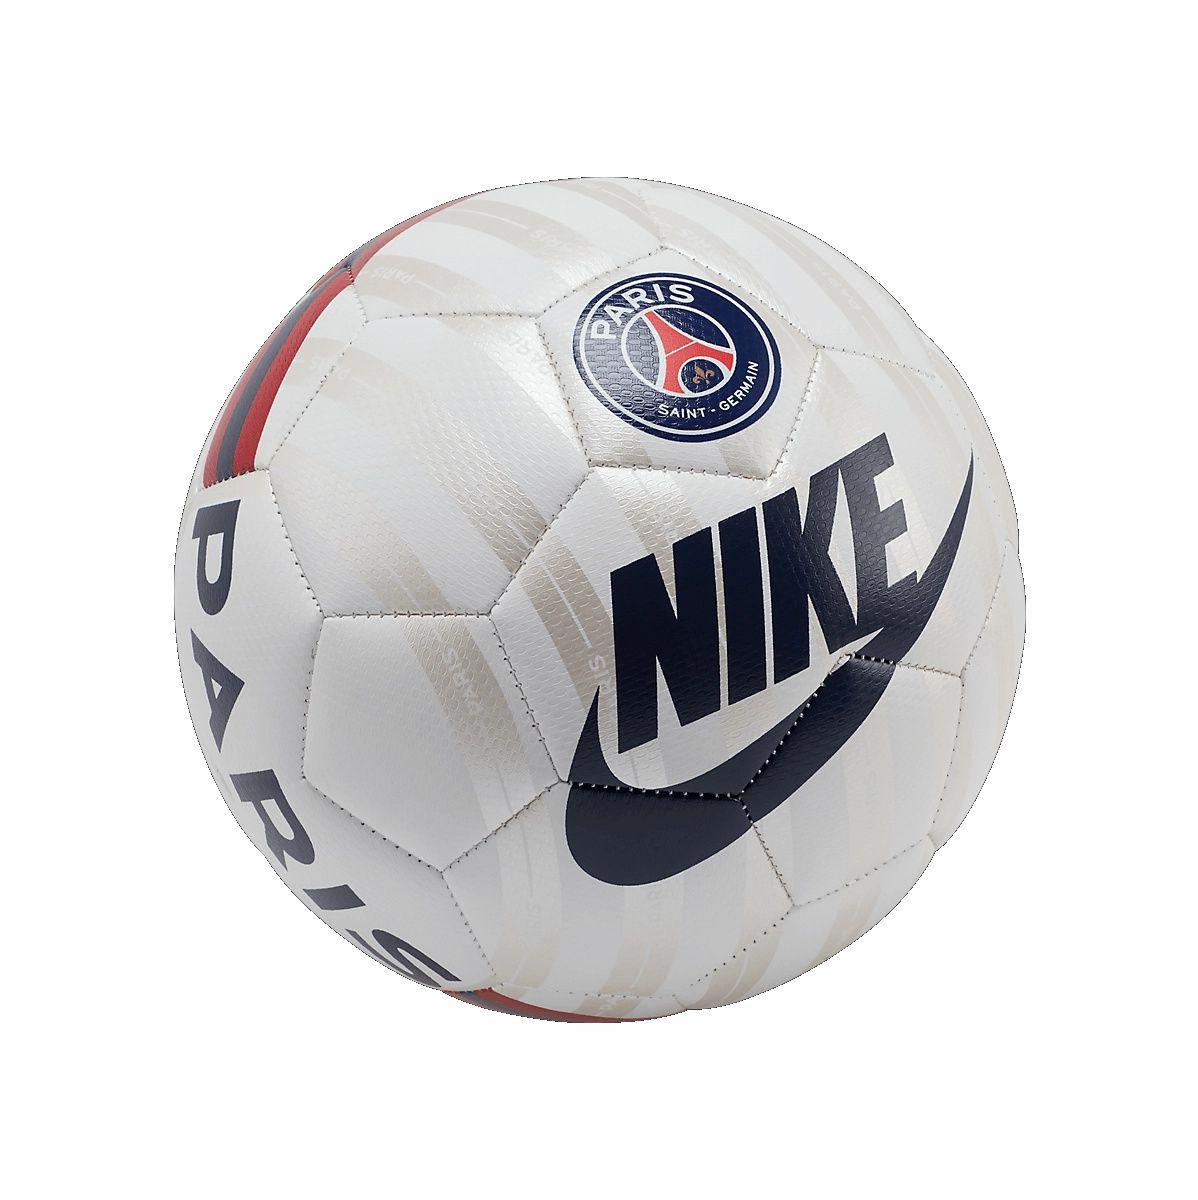 Bola Futebol Nike PSG Paris Saint-Germain Prestige Branca